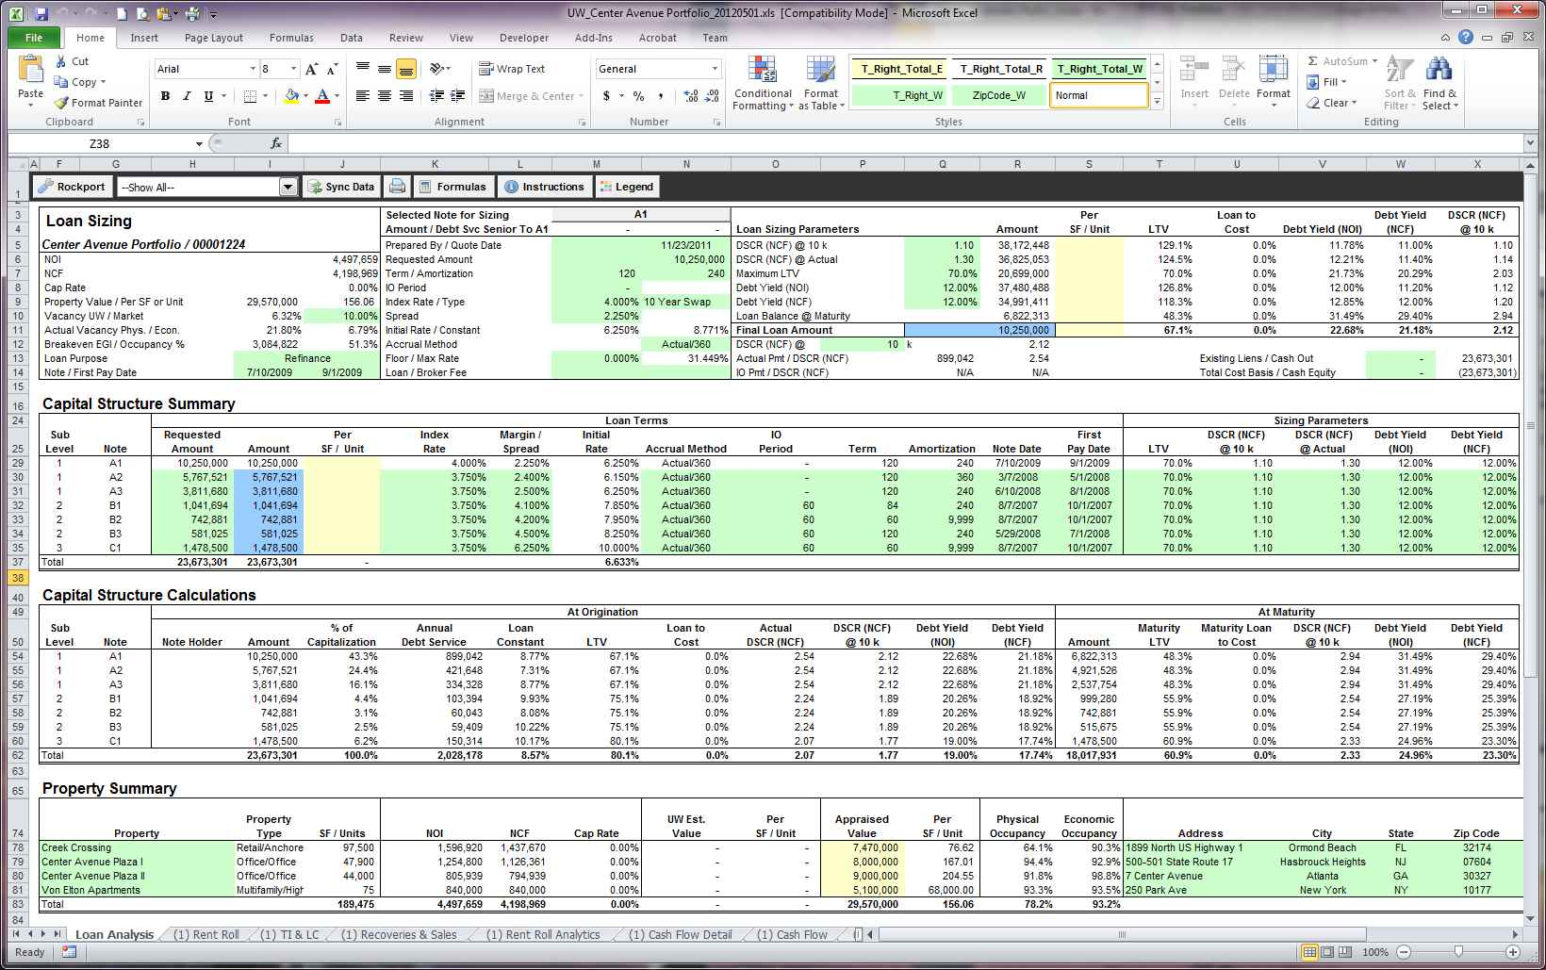 Property Management Spreadsheet Template Free Within Property Management Spreadsheet Free Download  Aljererlotgd